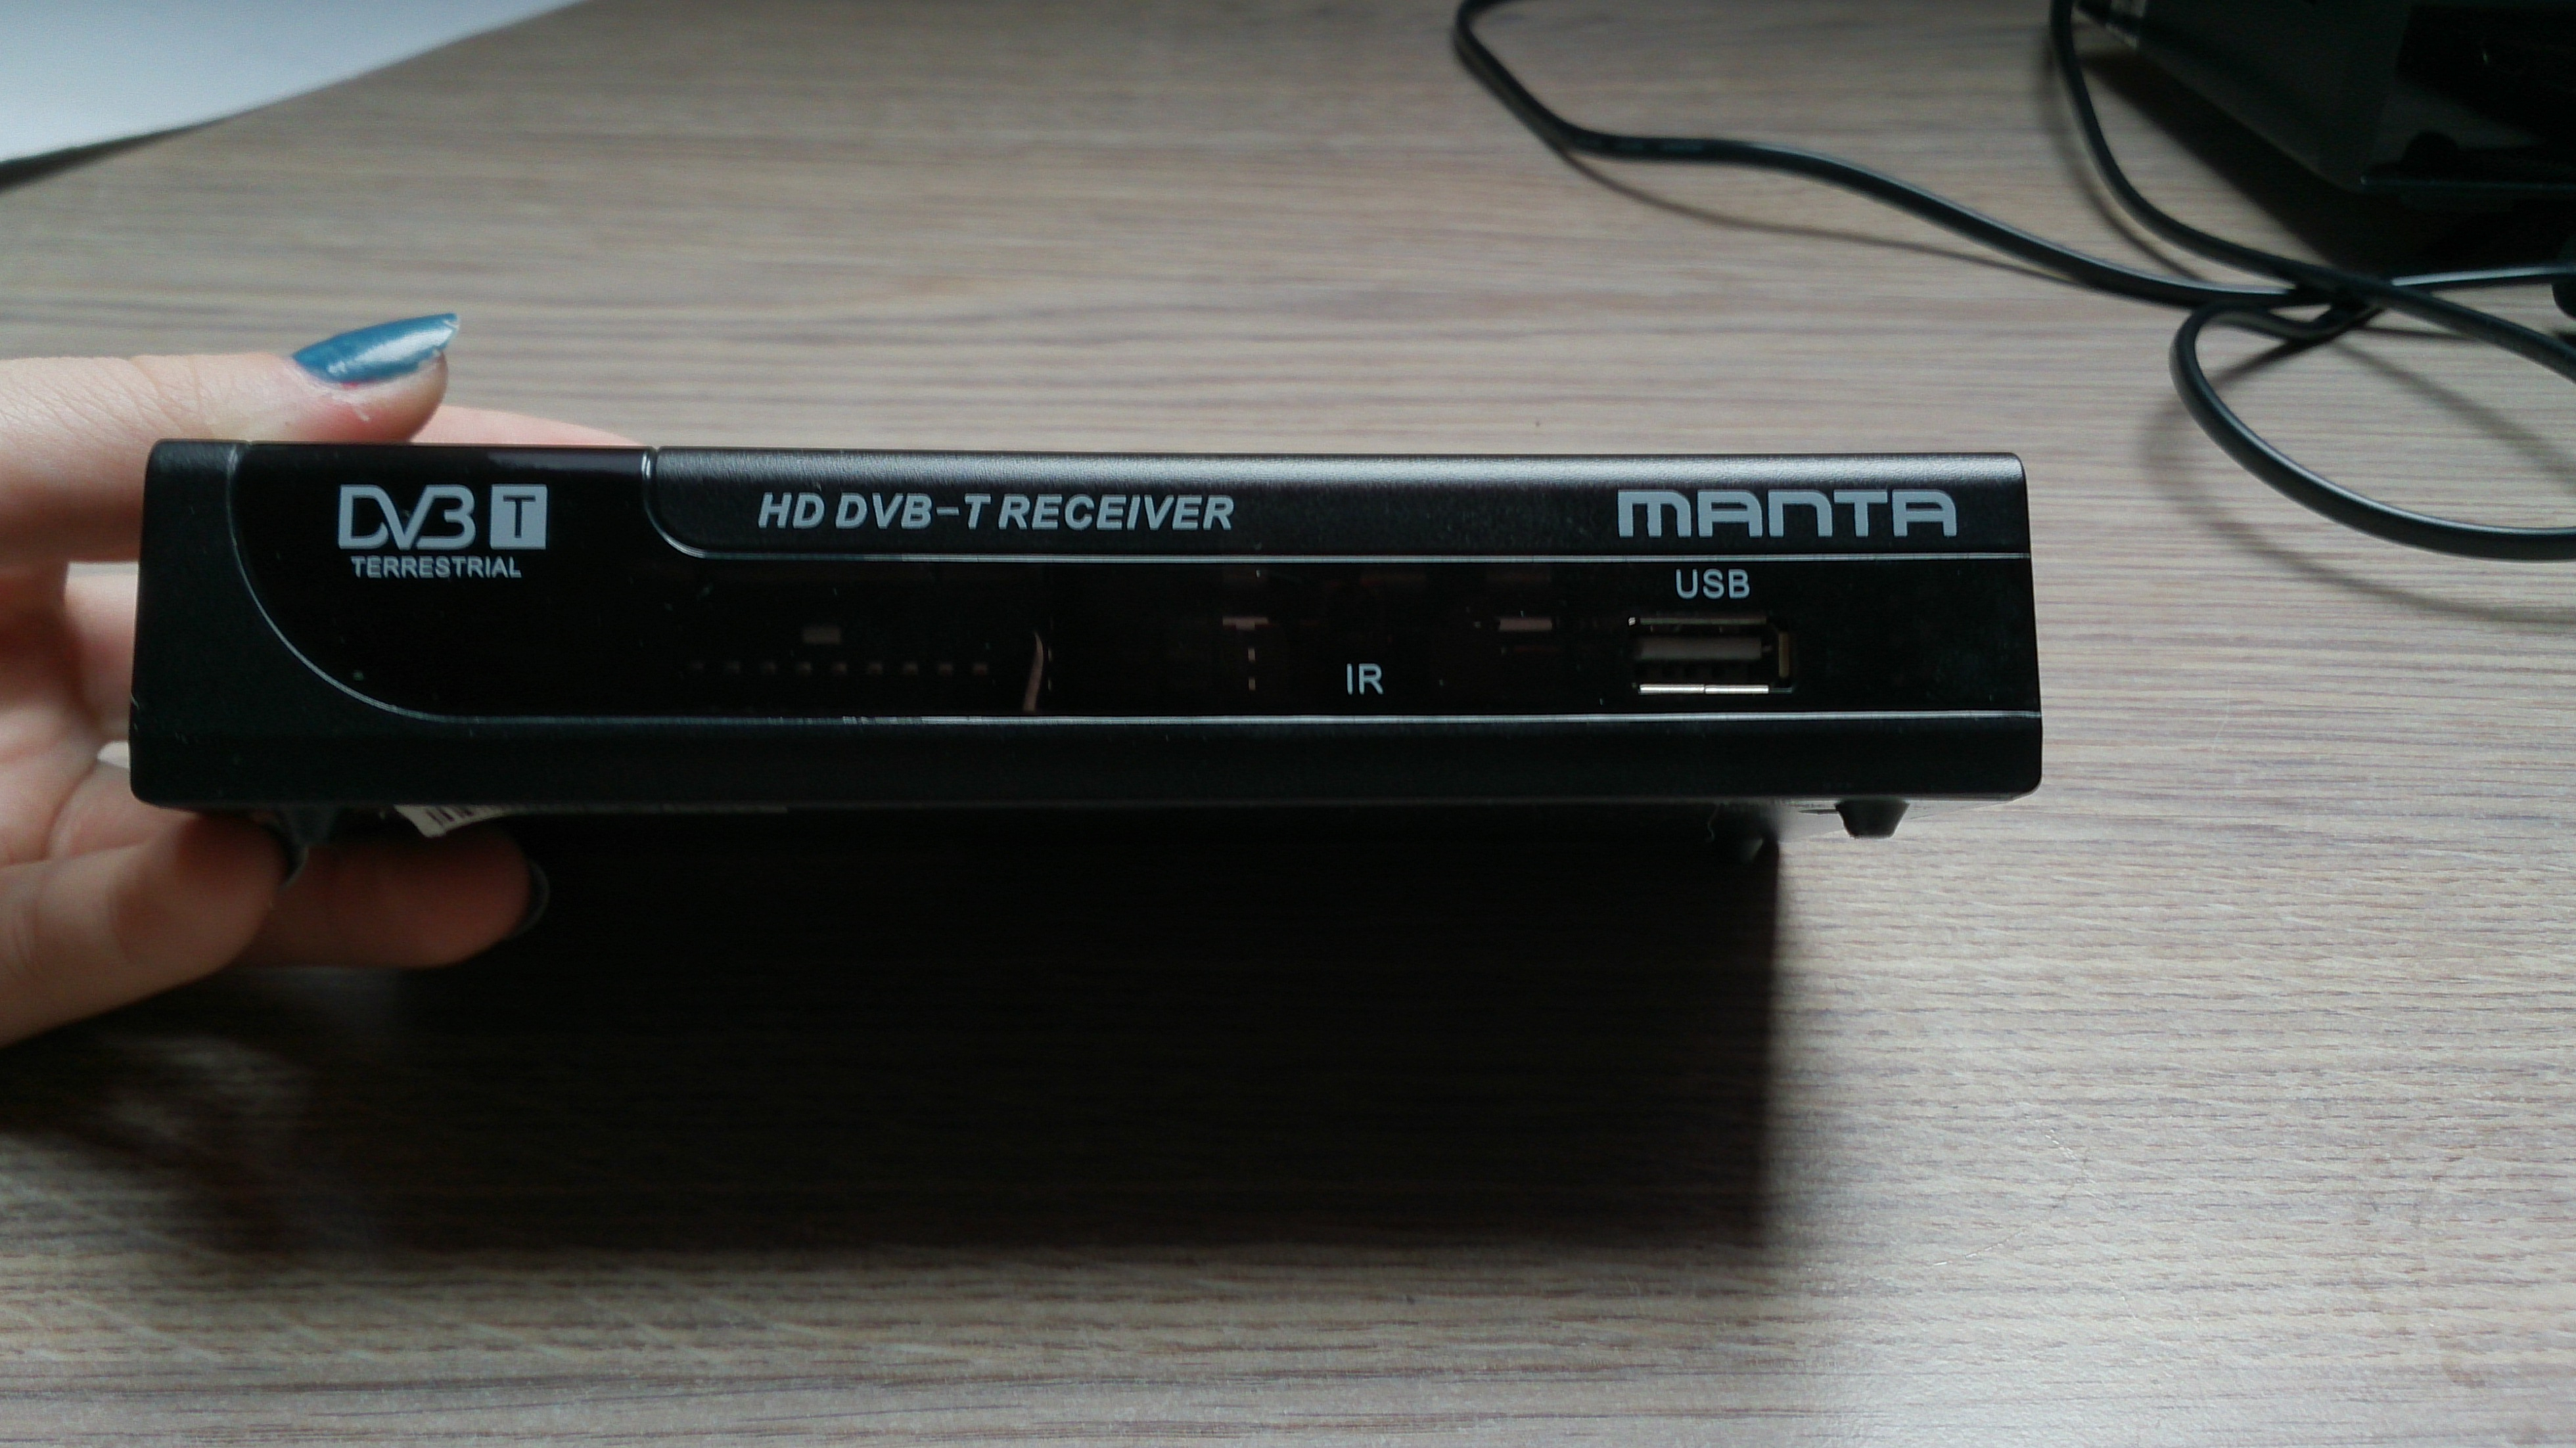 [Sprzedam] Dekoder Manta HD DVBT07